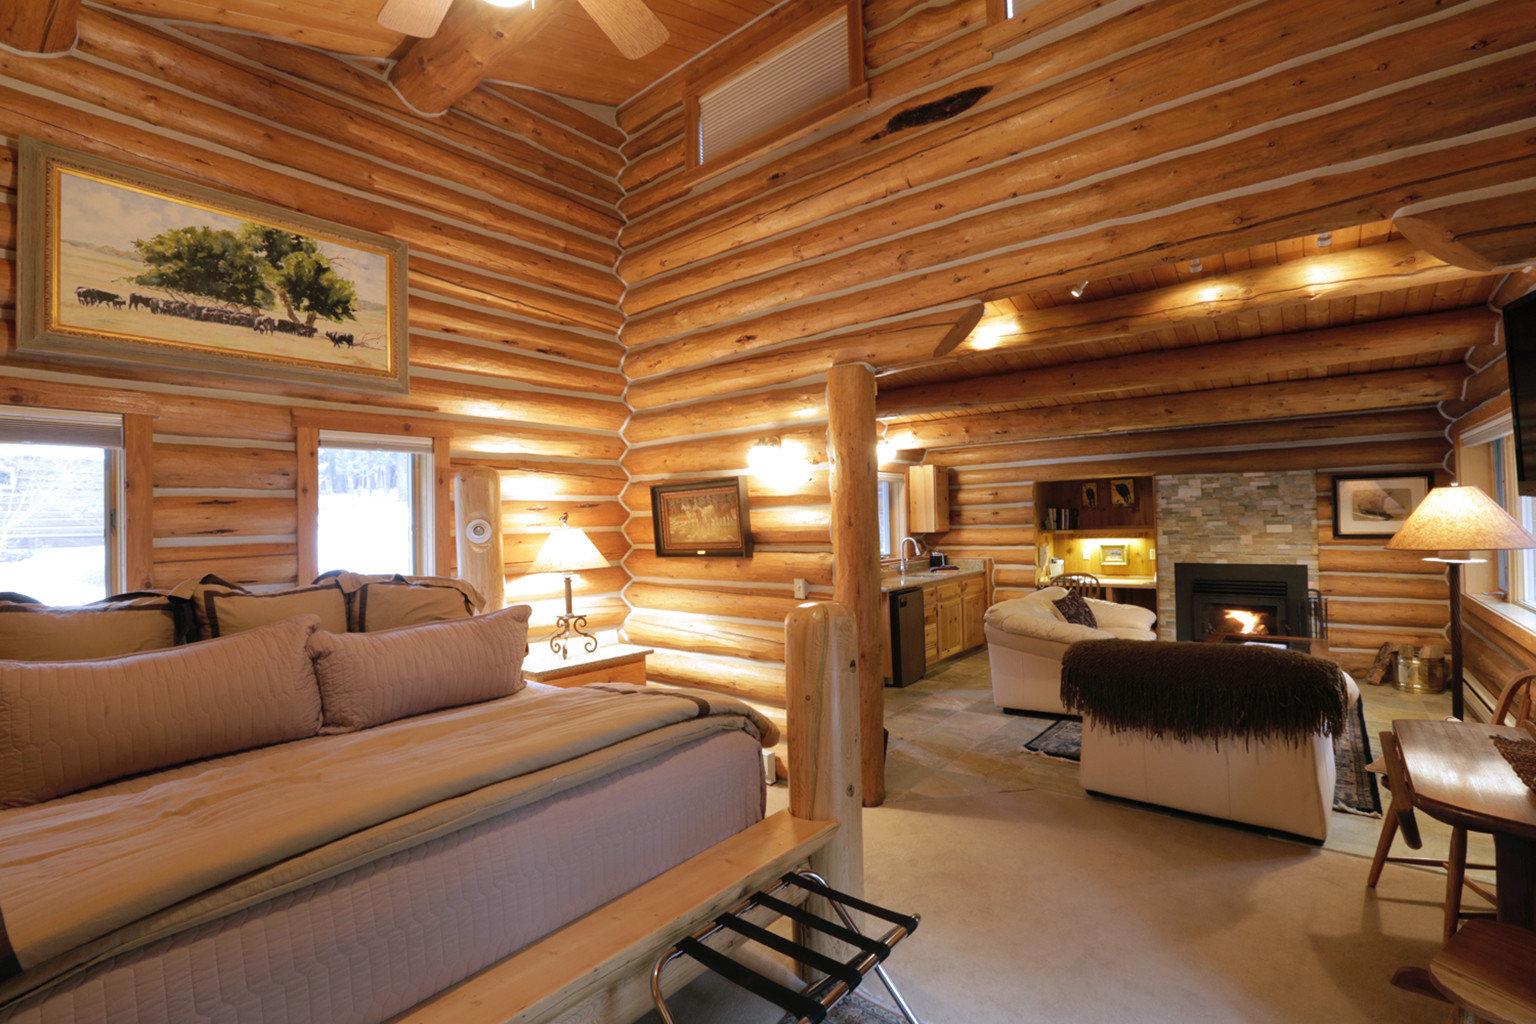 passenger ship property vehicle yacht Boat recreation room living room home log cabin billiard room cottage ship luxury yacht